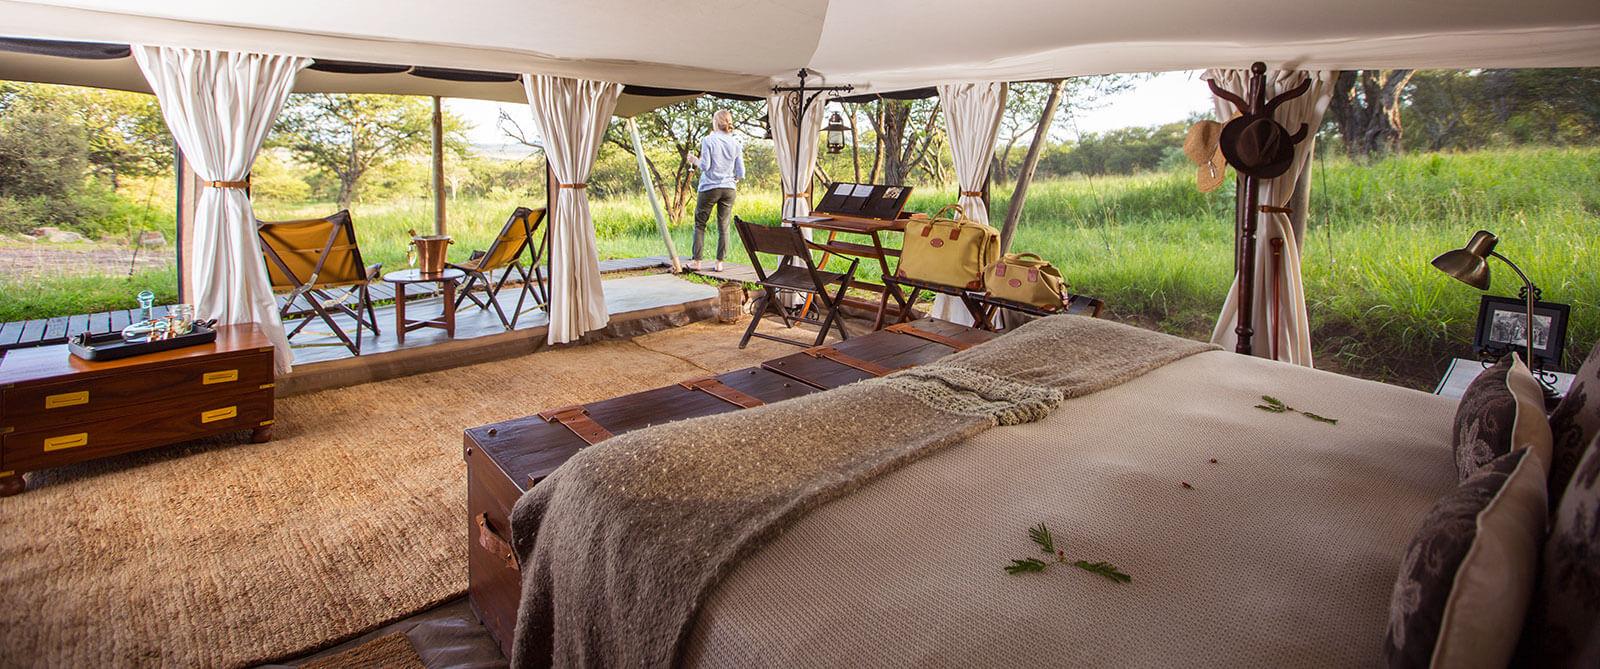 Serengeti Pioneer Camp - Great Migration Tented Camp - Tanzania Safari Honeymoon